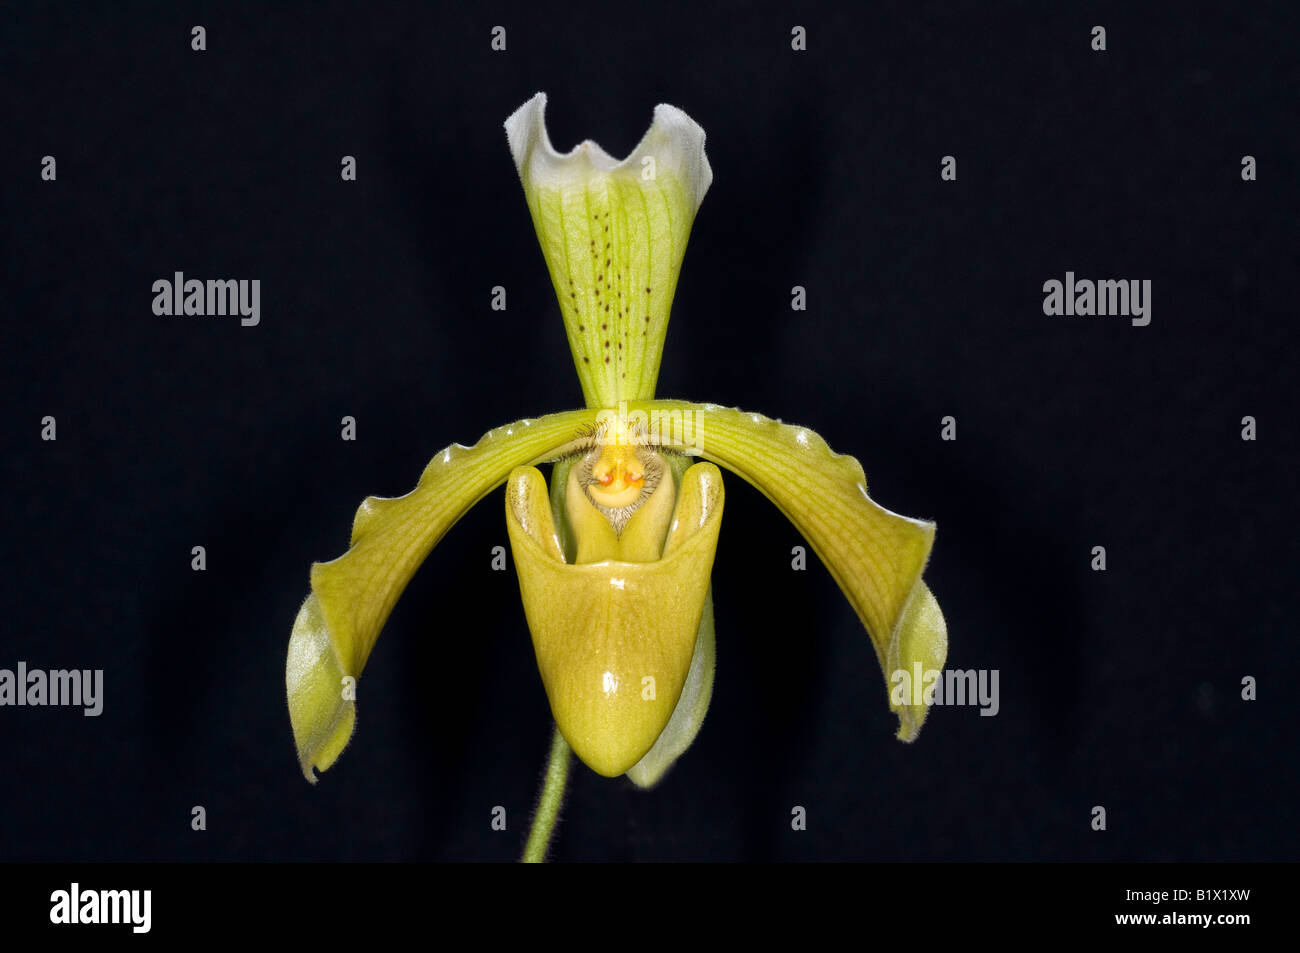 Yellow Slipper Orchid Flower Paphiopedilum Stock Photo 18397313